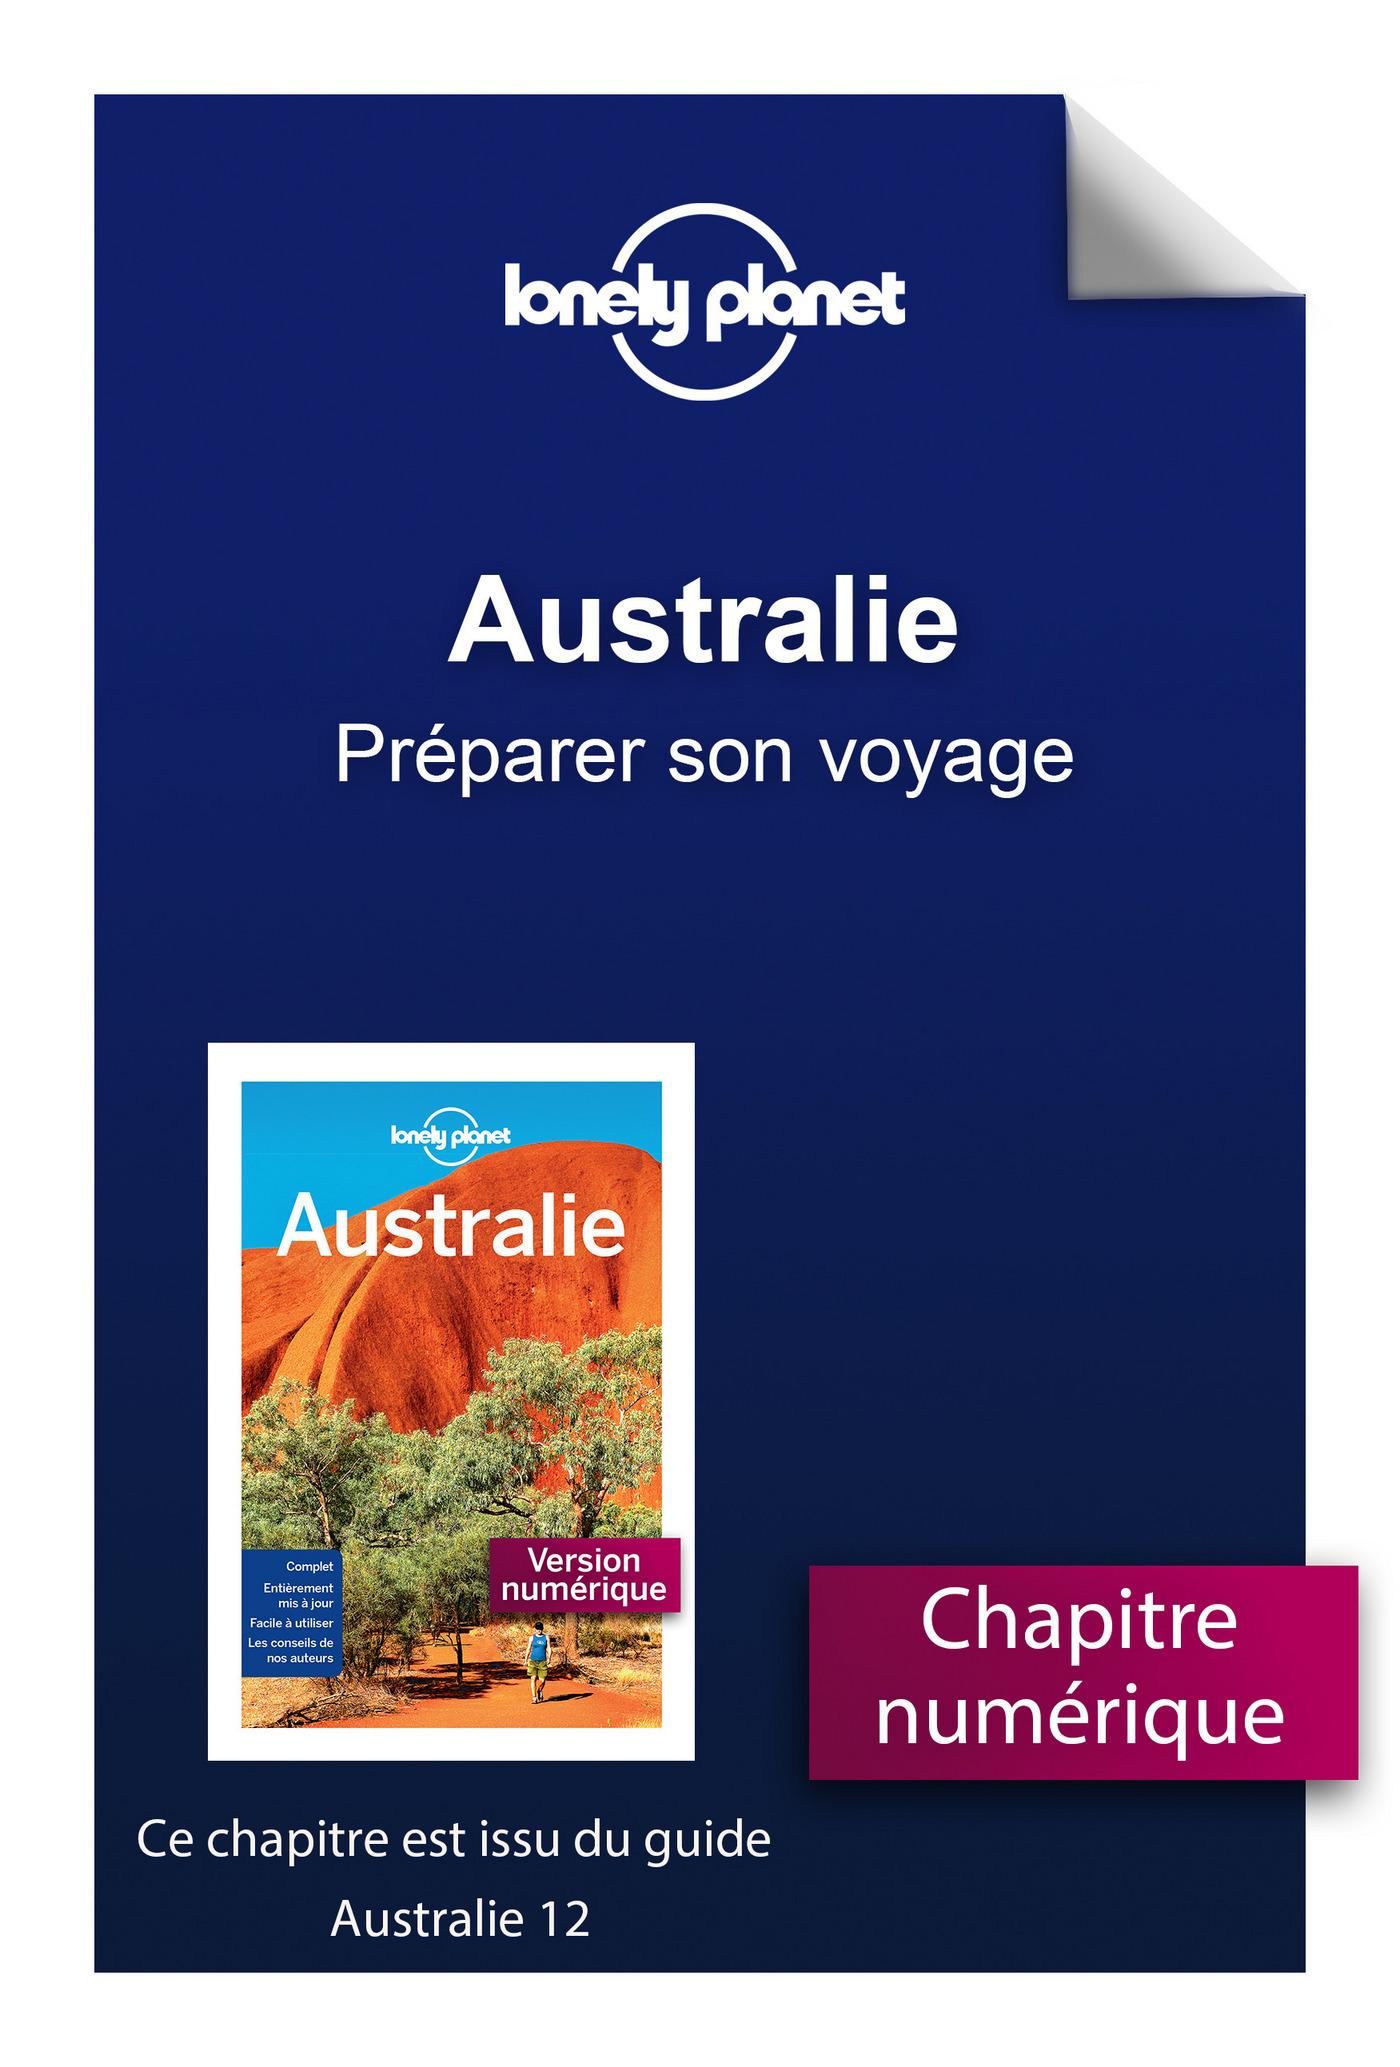 Australie - Préparer son voyage